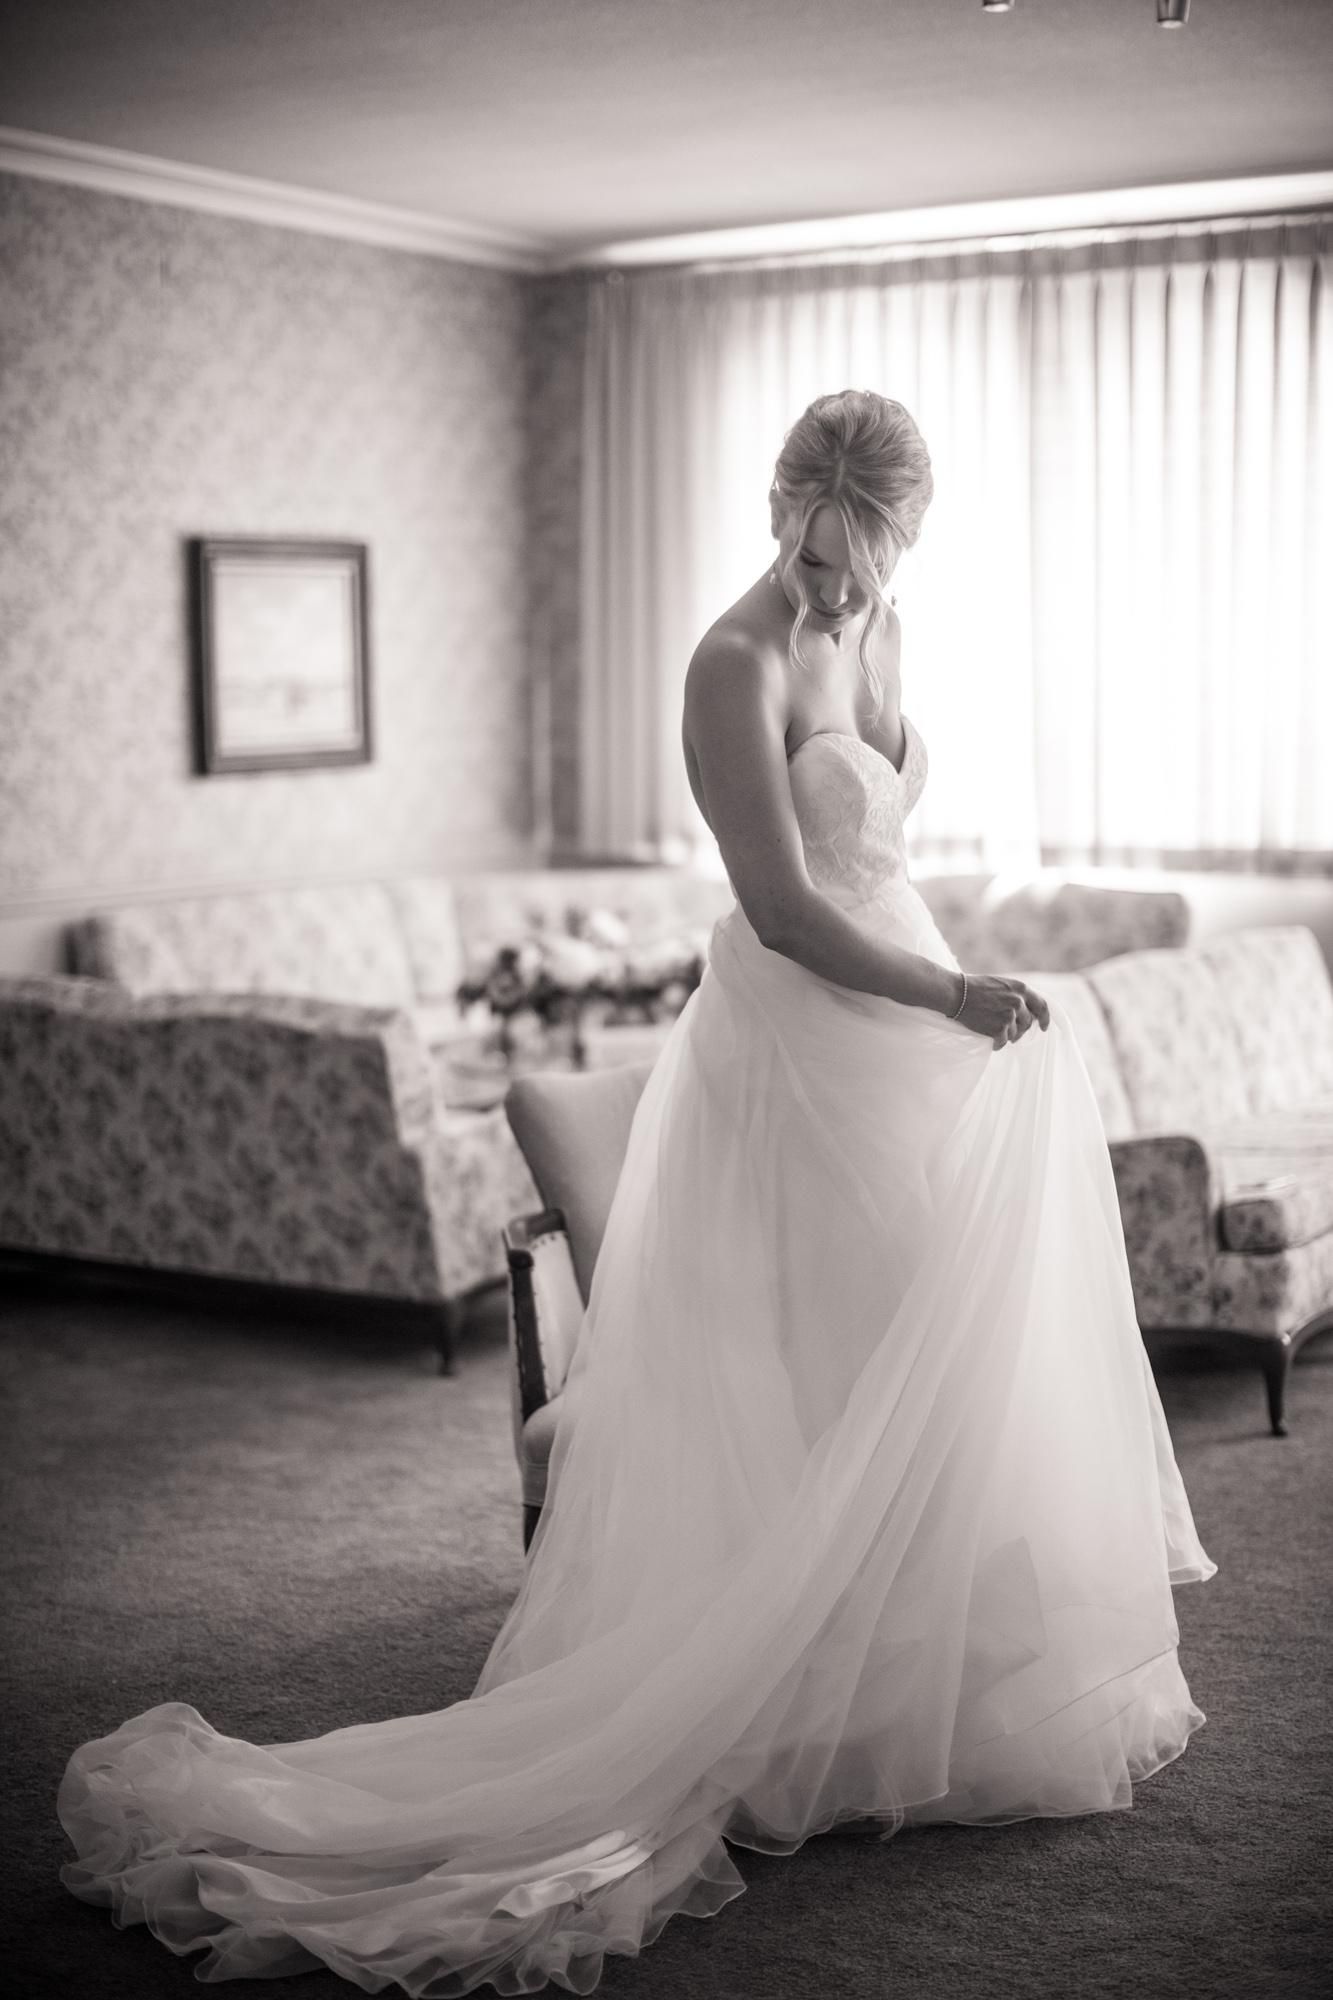 rachel_todd_wedding_0140.jpg